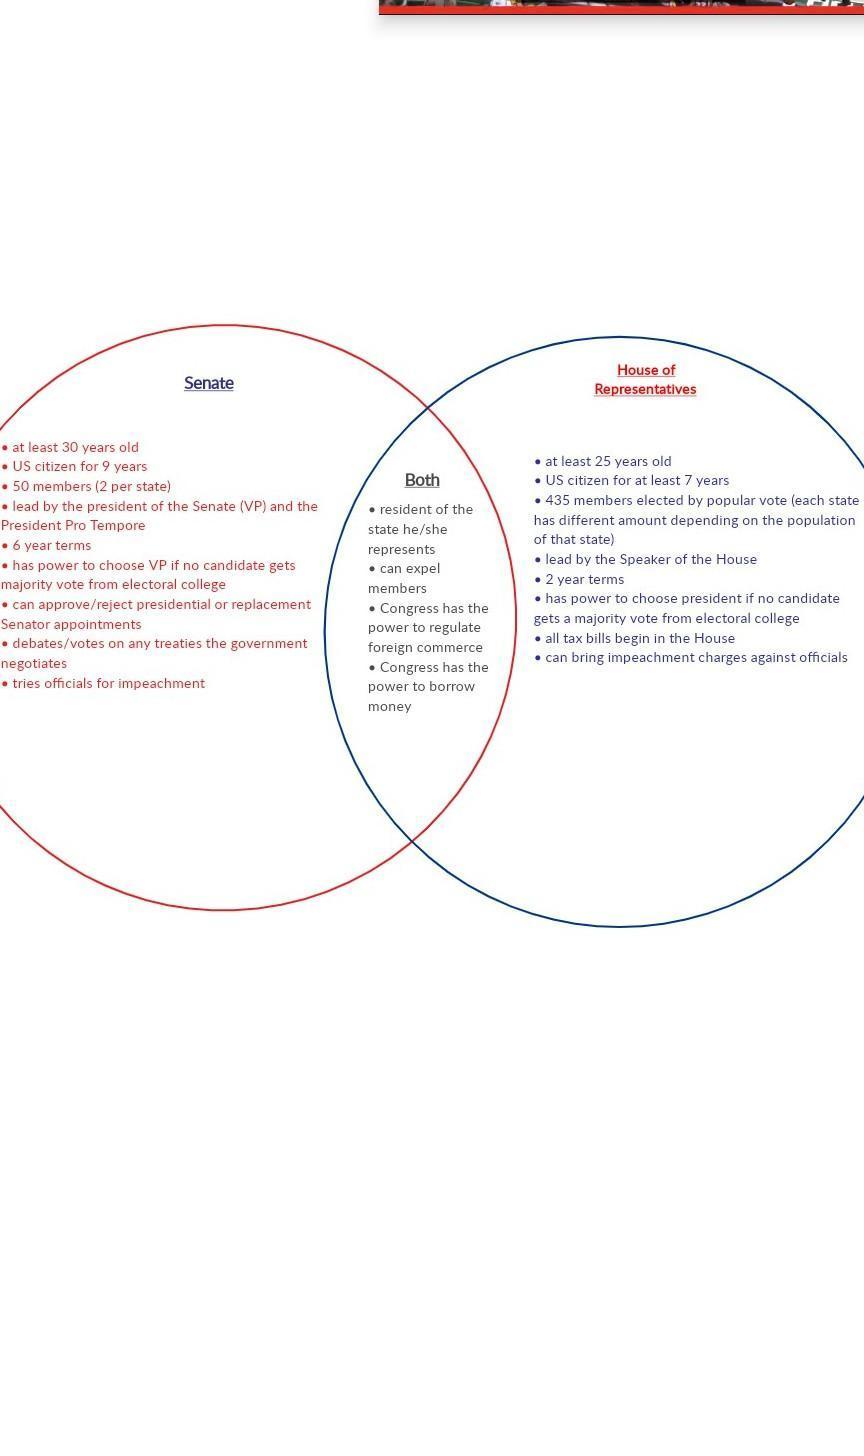 House of Representatives and Senate comparison chart